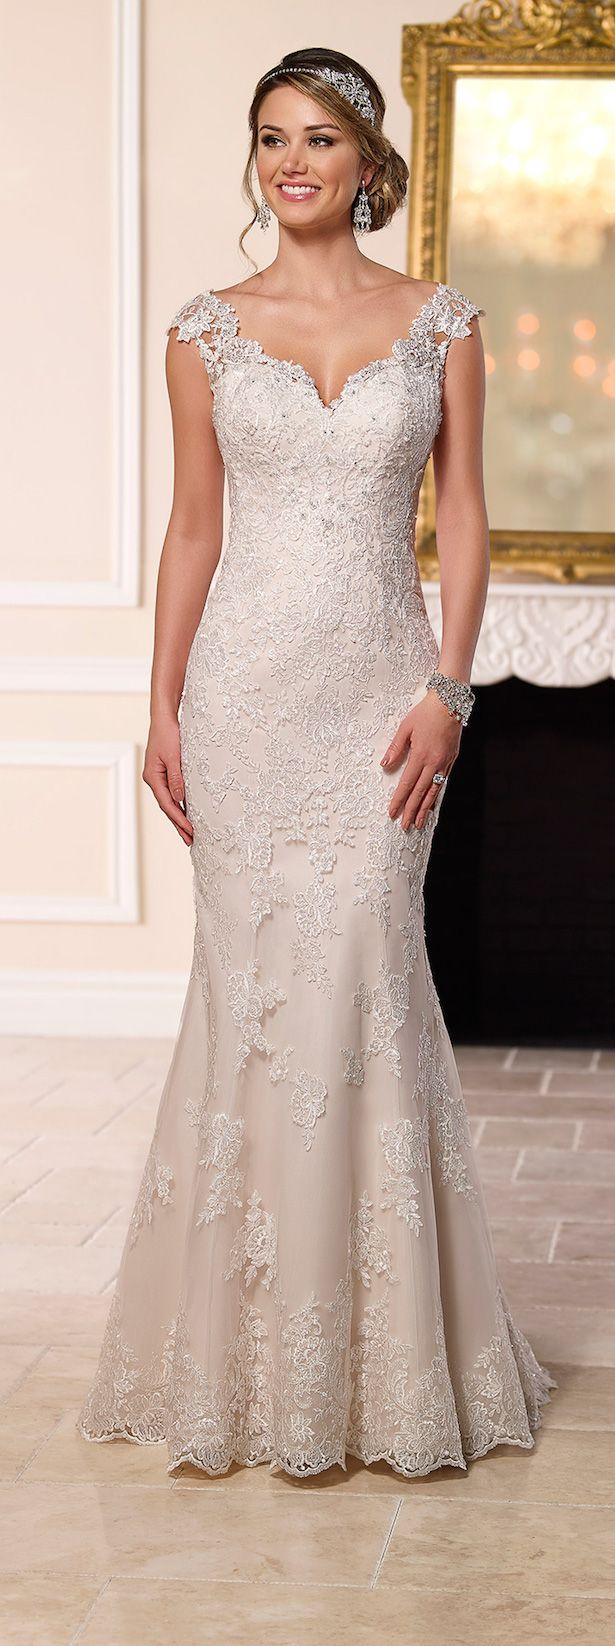 Mariage - Gorgeous Long Dress